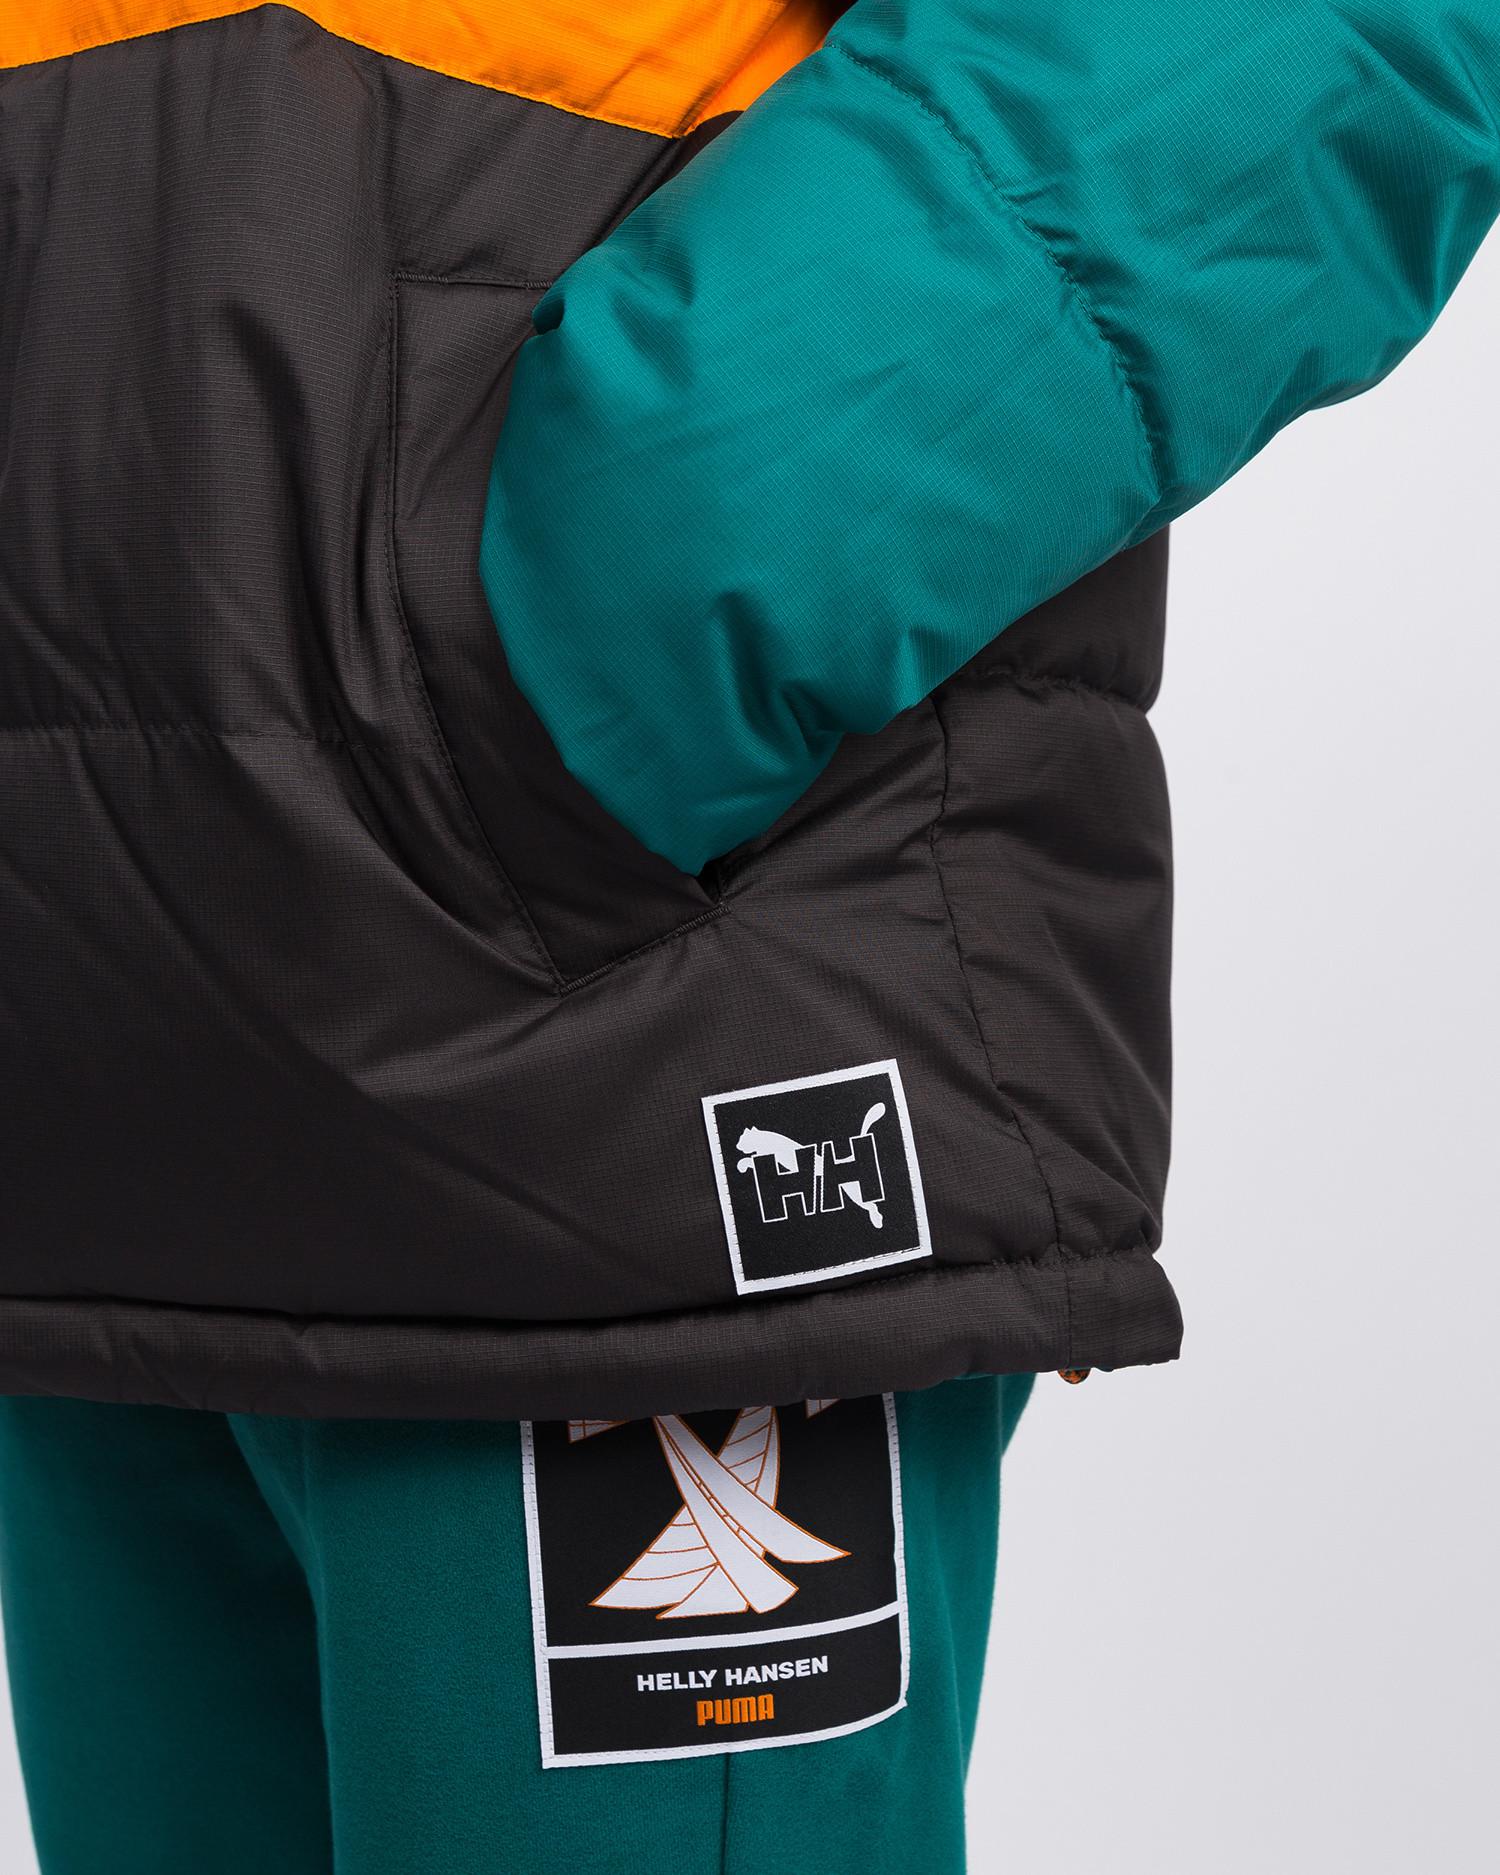 Puma x Helly Hansen Jacket AOP front/Teal green